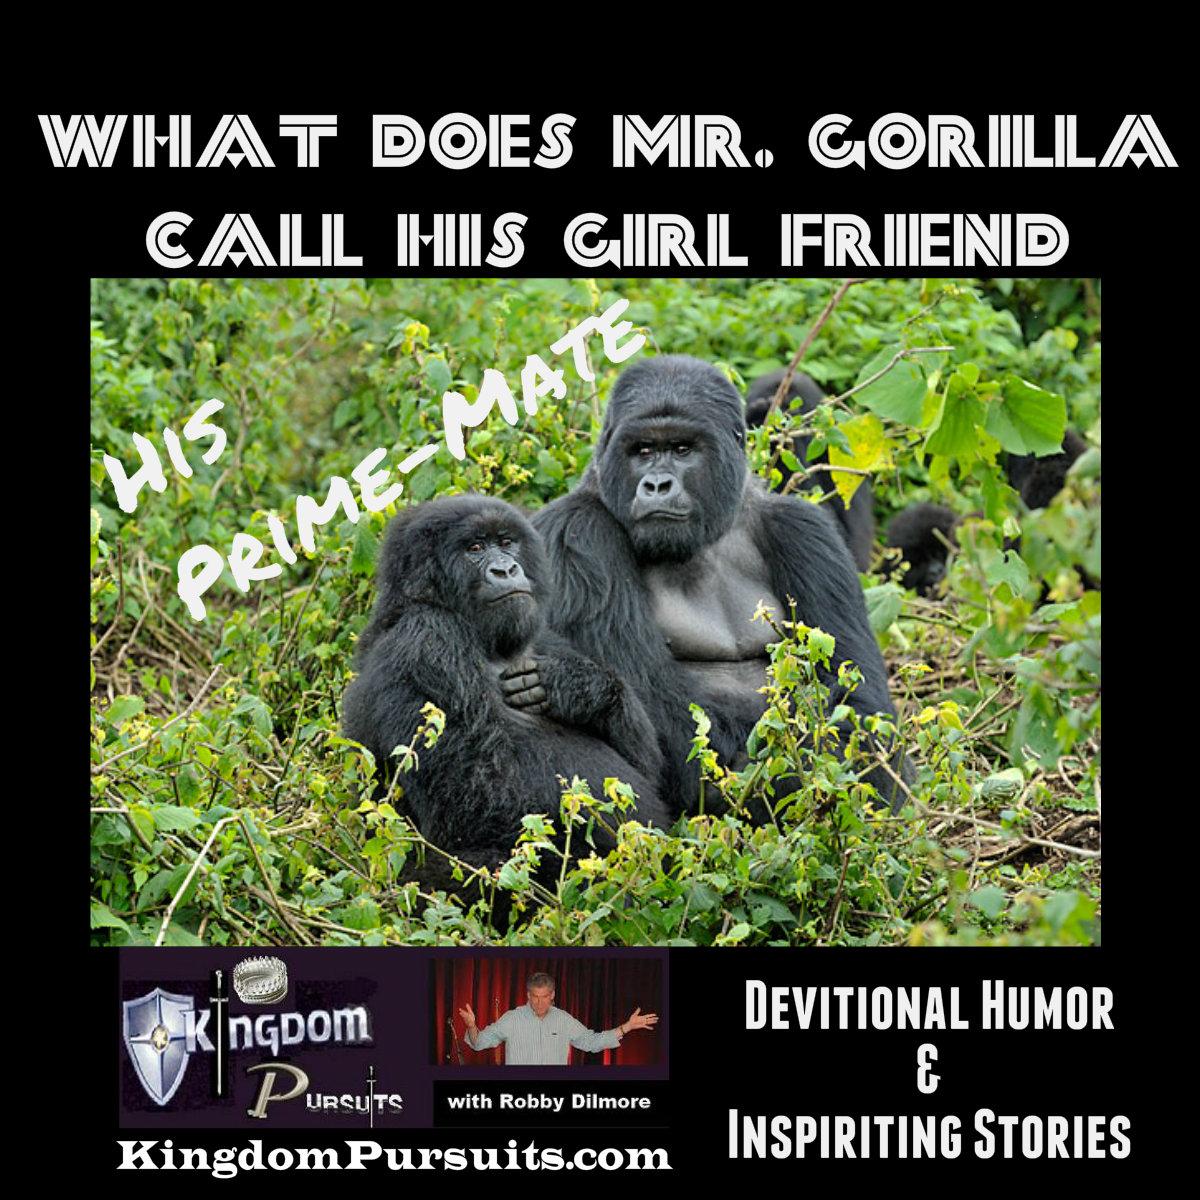 Devotional Humor And Inspiring Stories for June 15, 2017